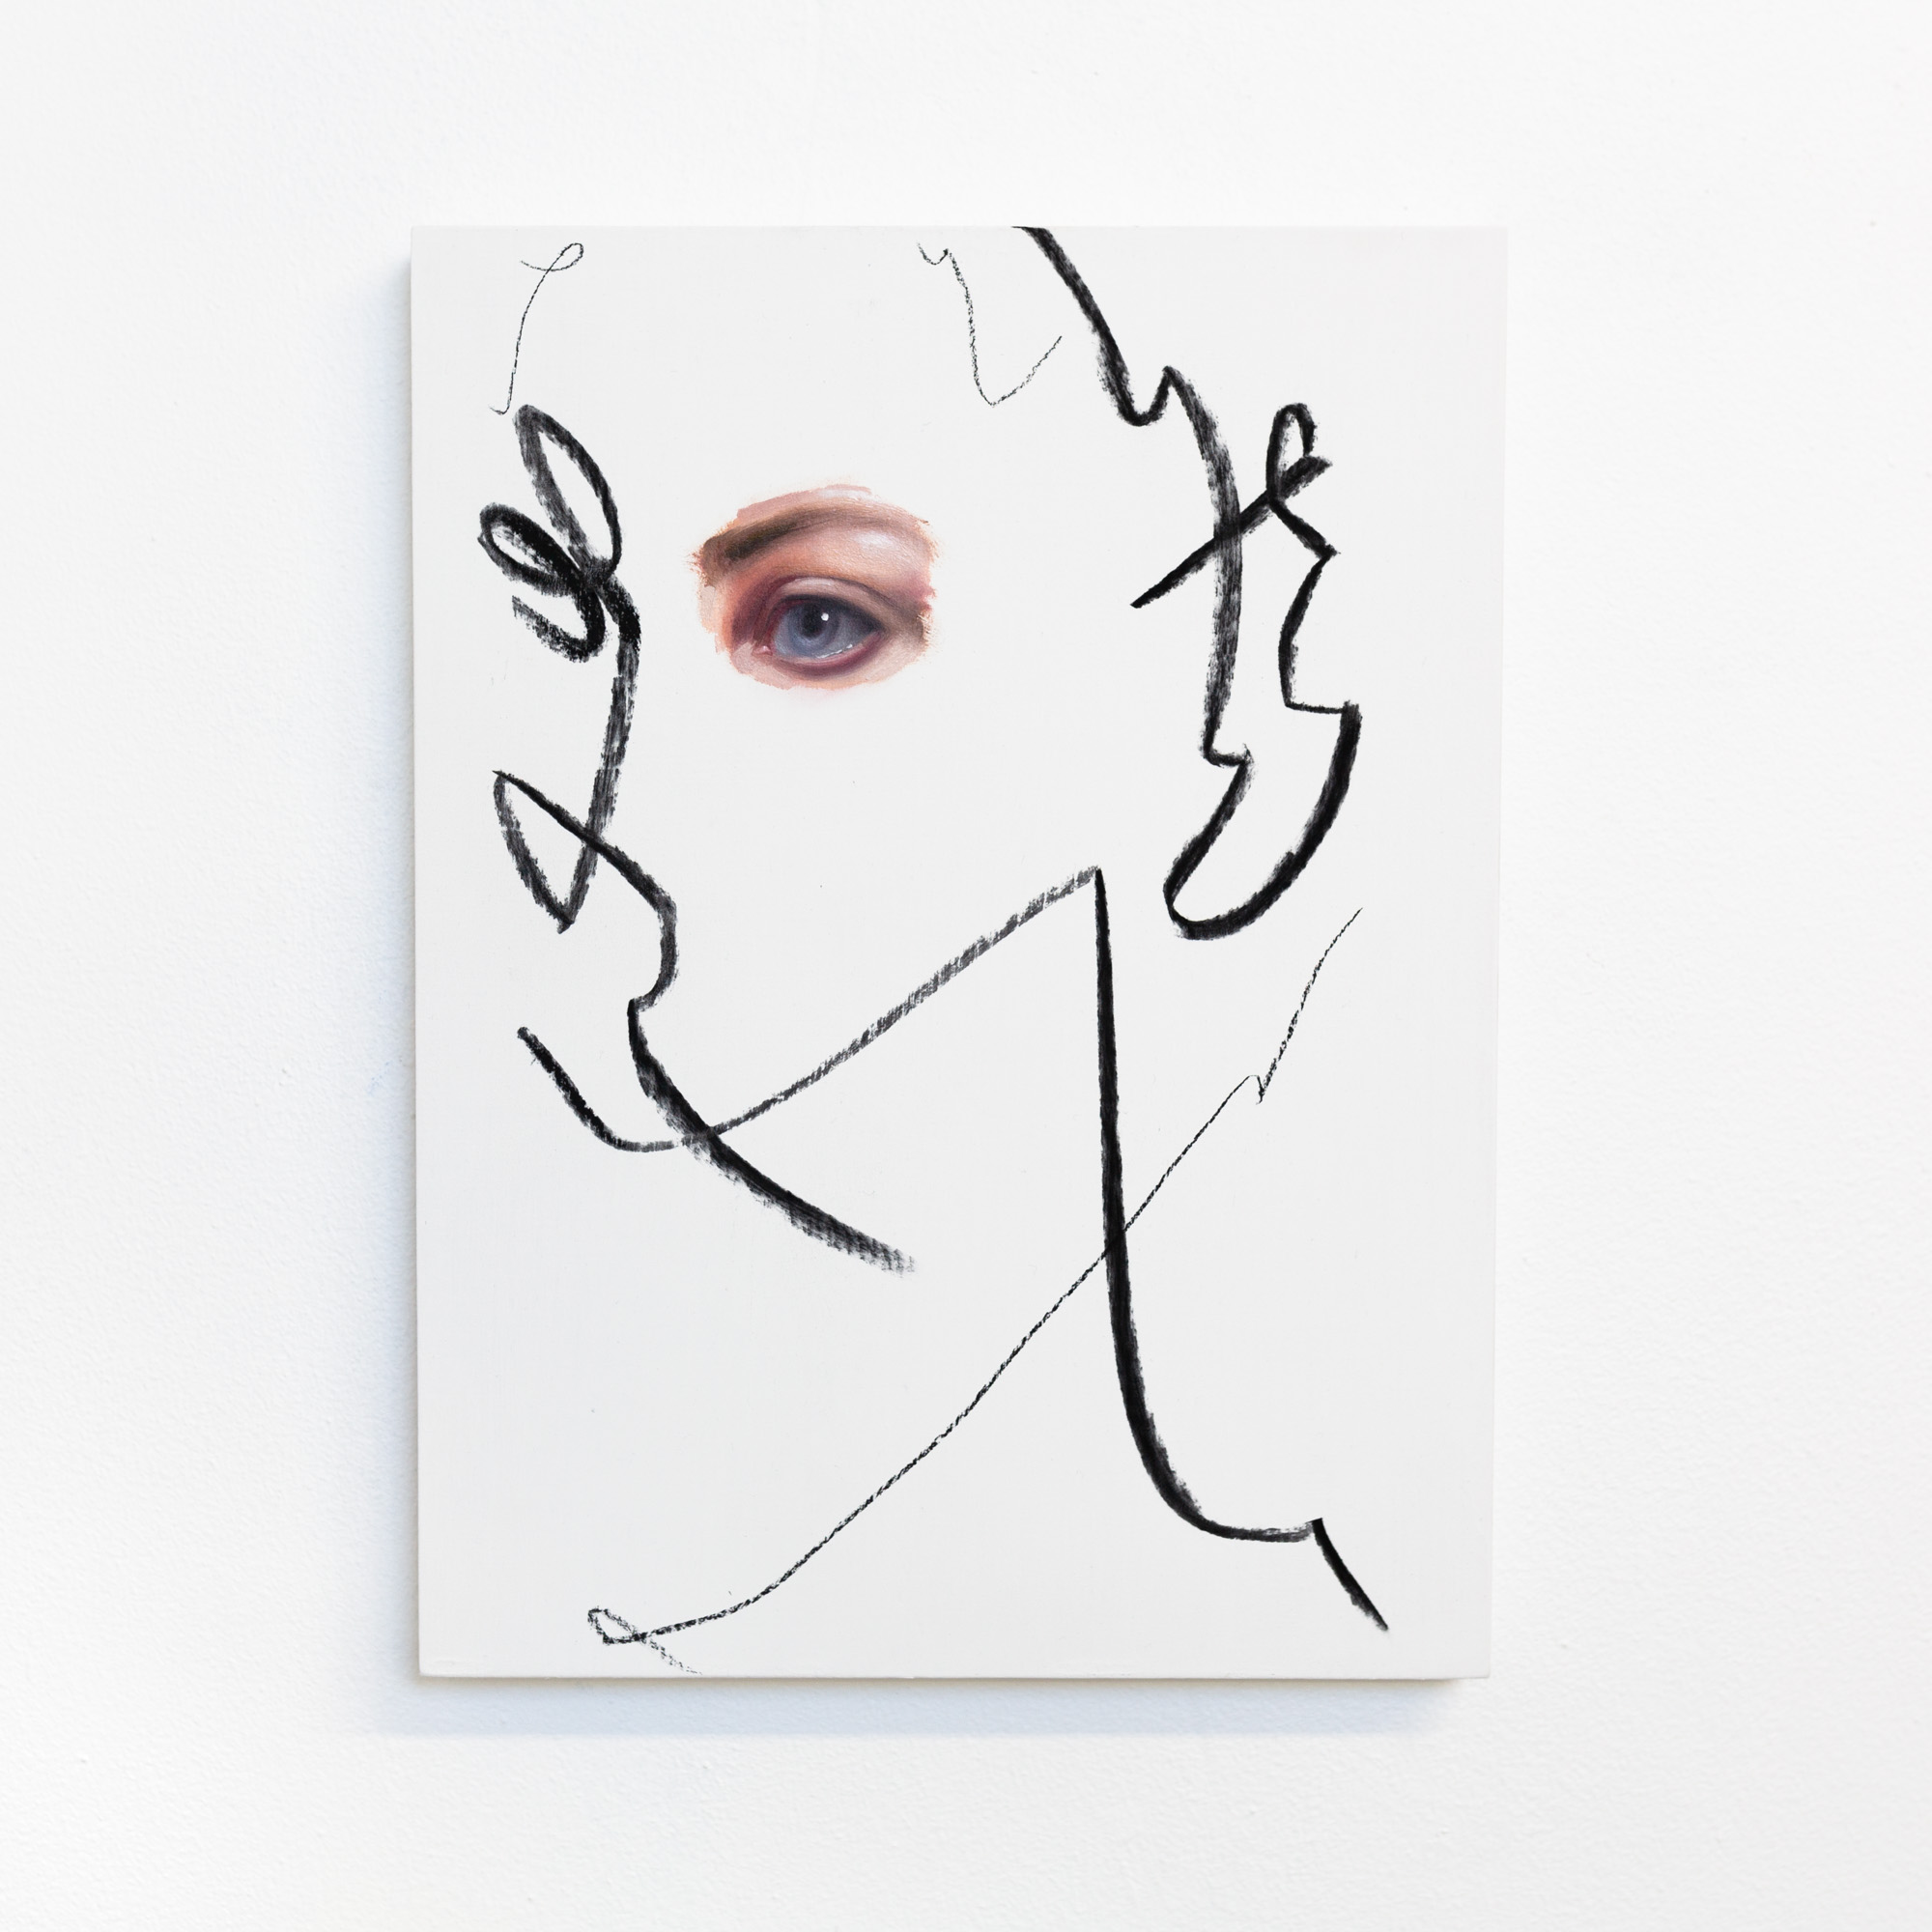 Portrait study 7, 2020, 32x23cm, oil on board